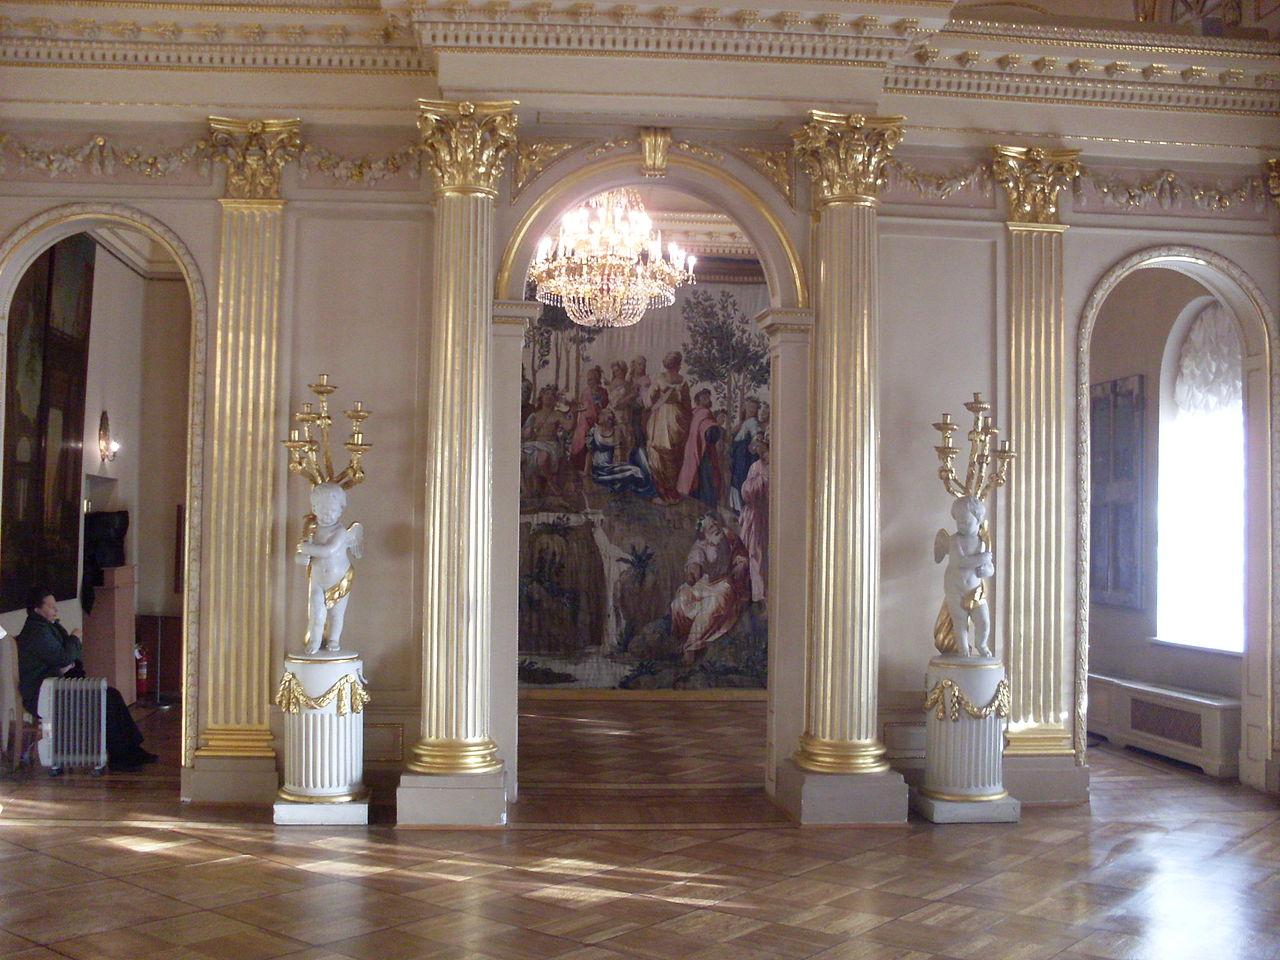 Меншиковский дворец, интерьеры